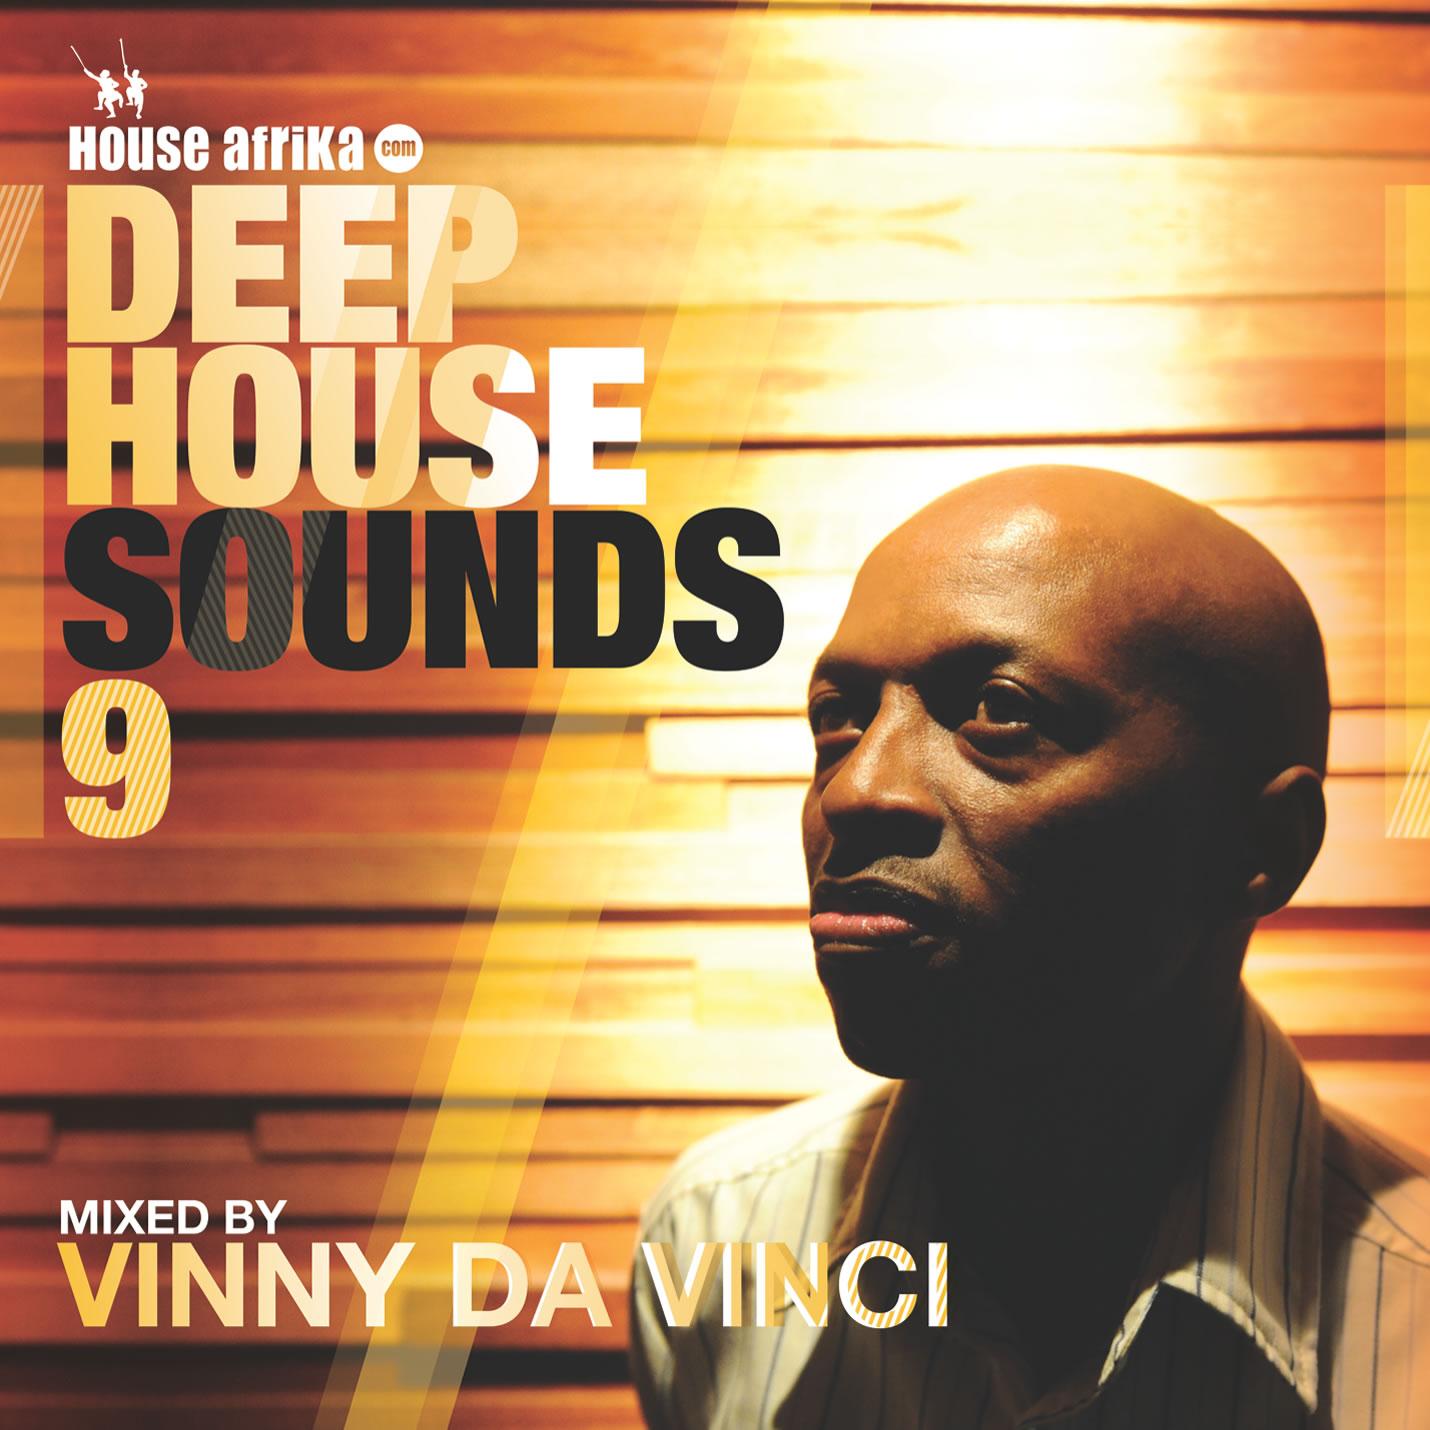 Dj 39 s production vinny da vince presents deep house sounds for 80s deep house